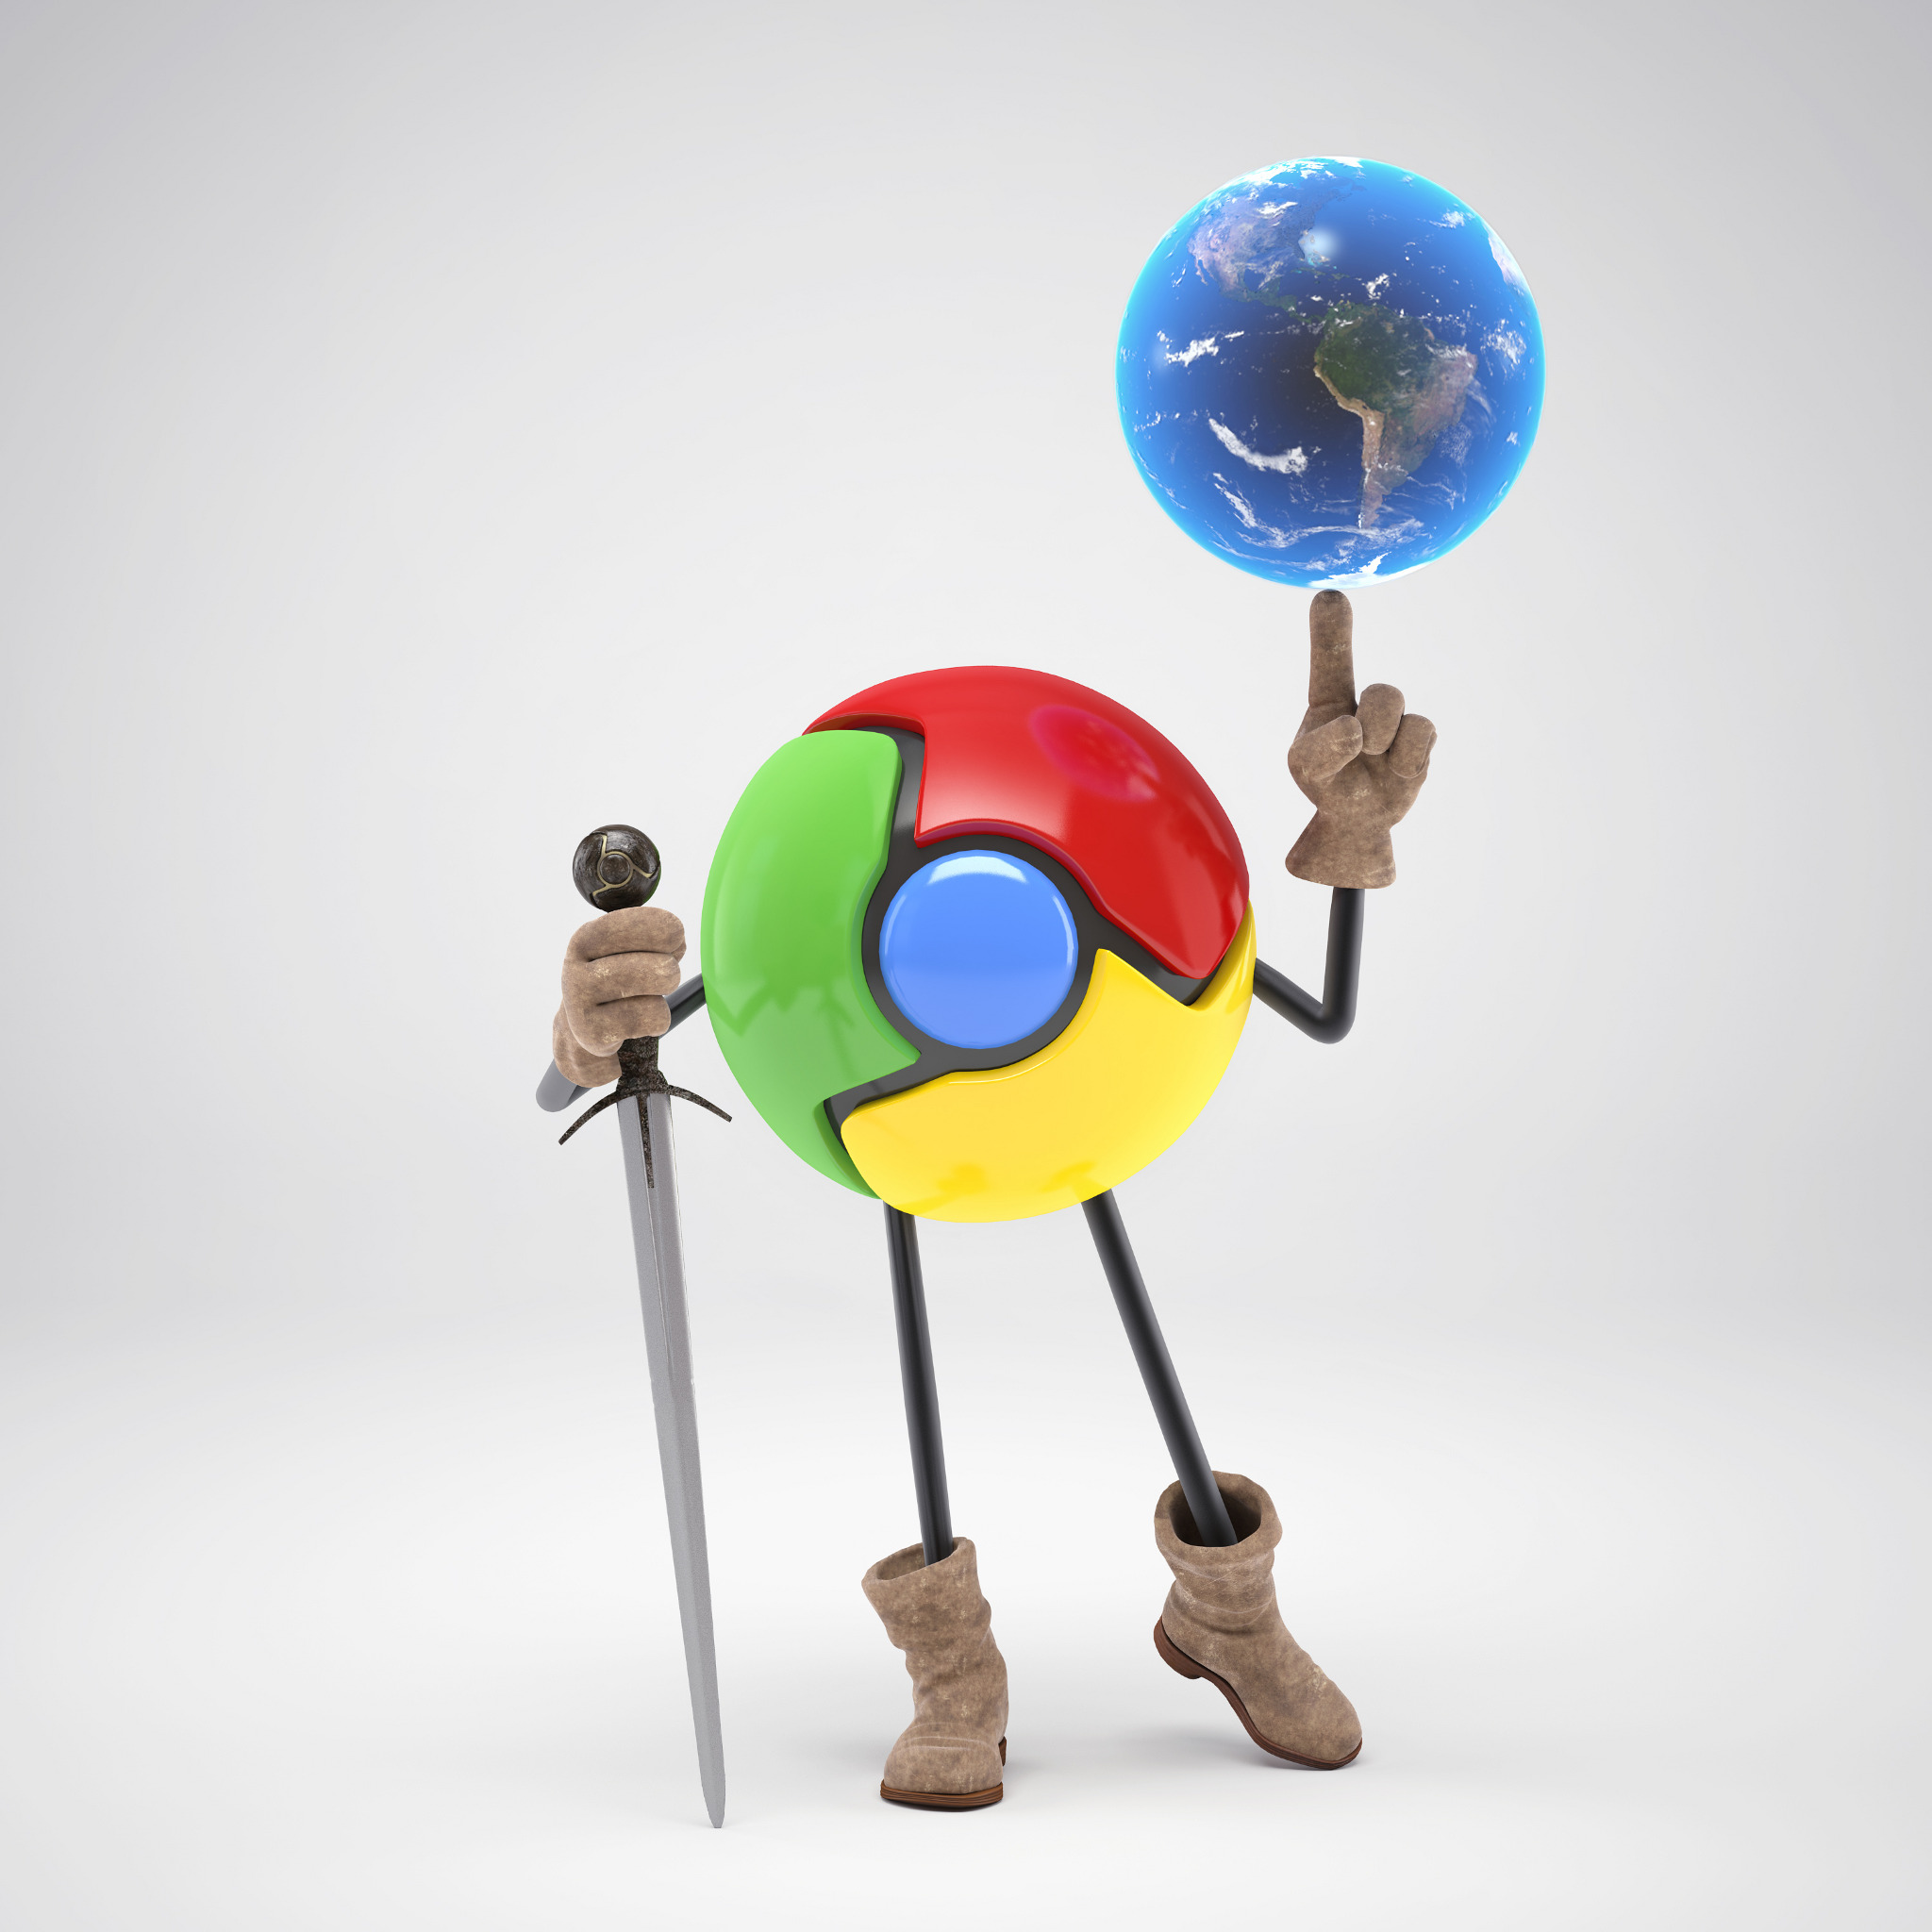 Google-Game-of-Thrones-chrome_01_o.jpg